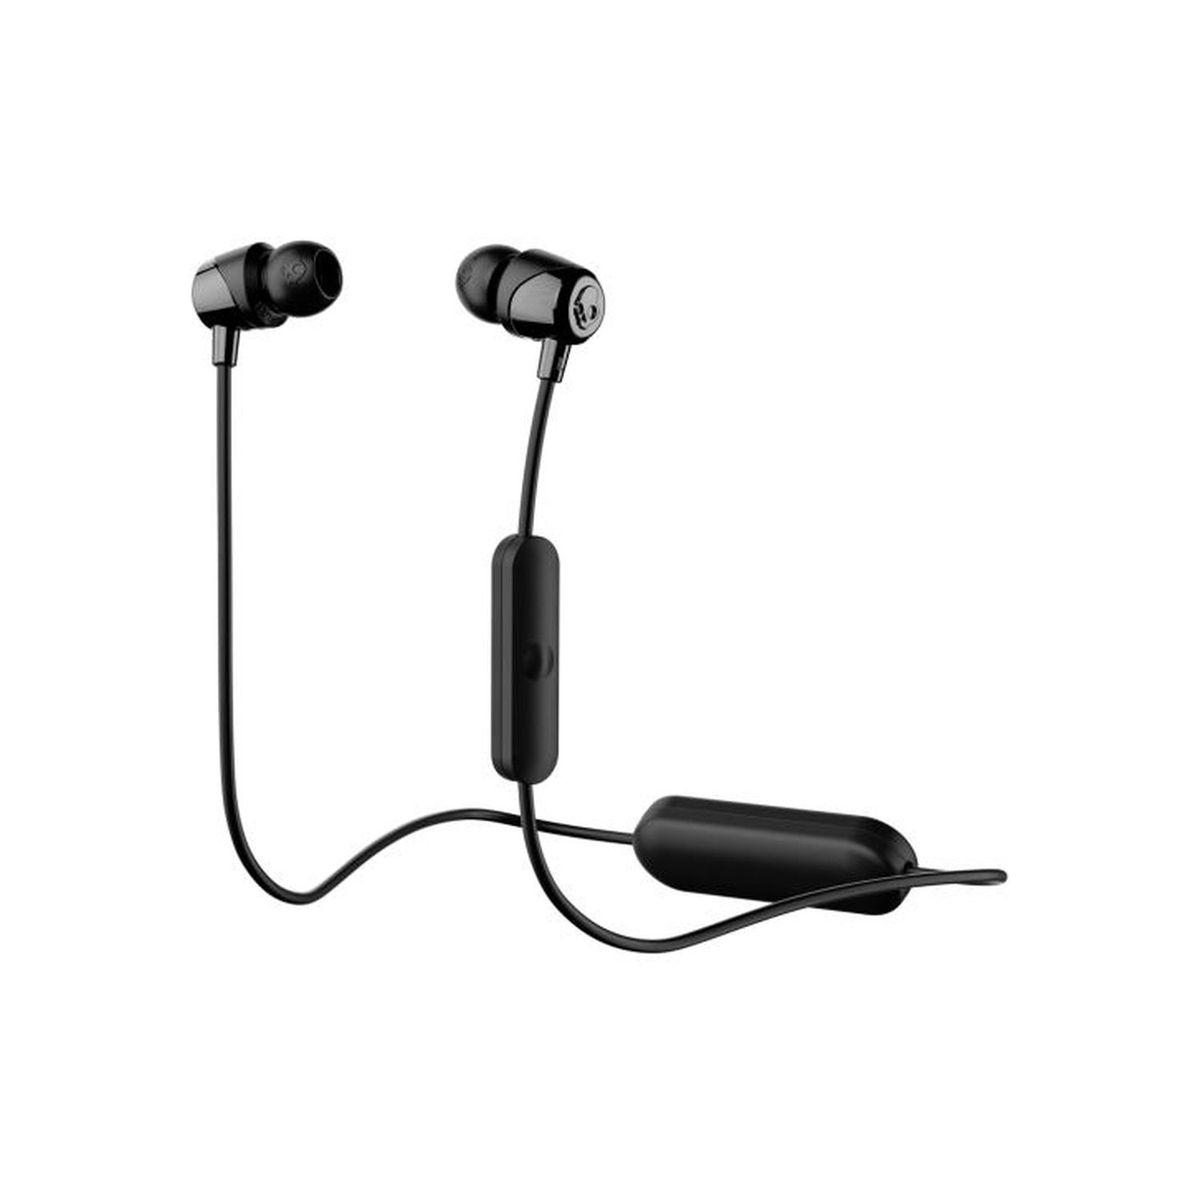 Ecouteurs JIB Wireless -  Bluetooth - Avec micro -  Intra-aural - Noir